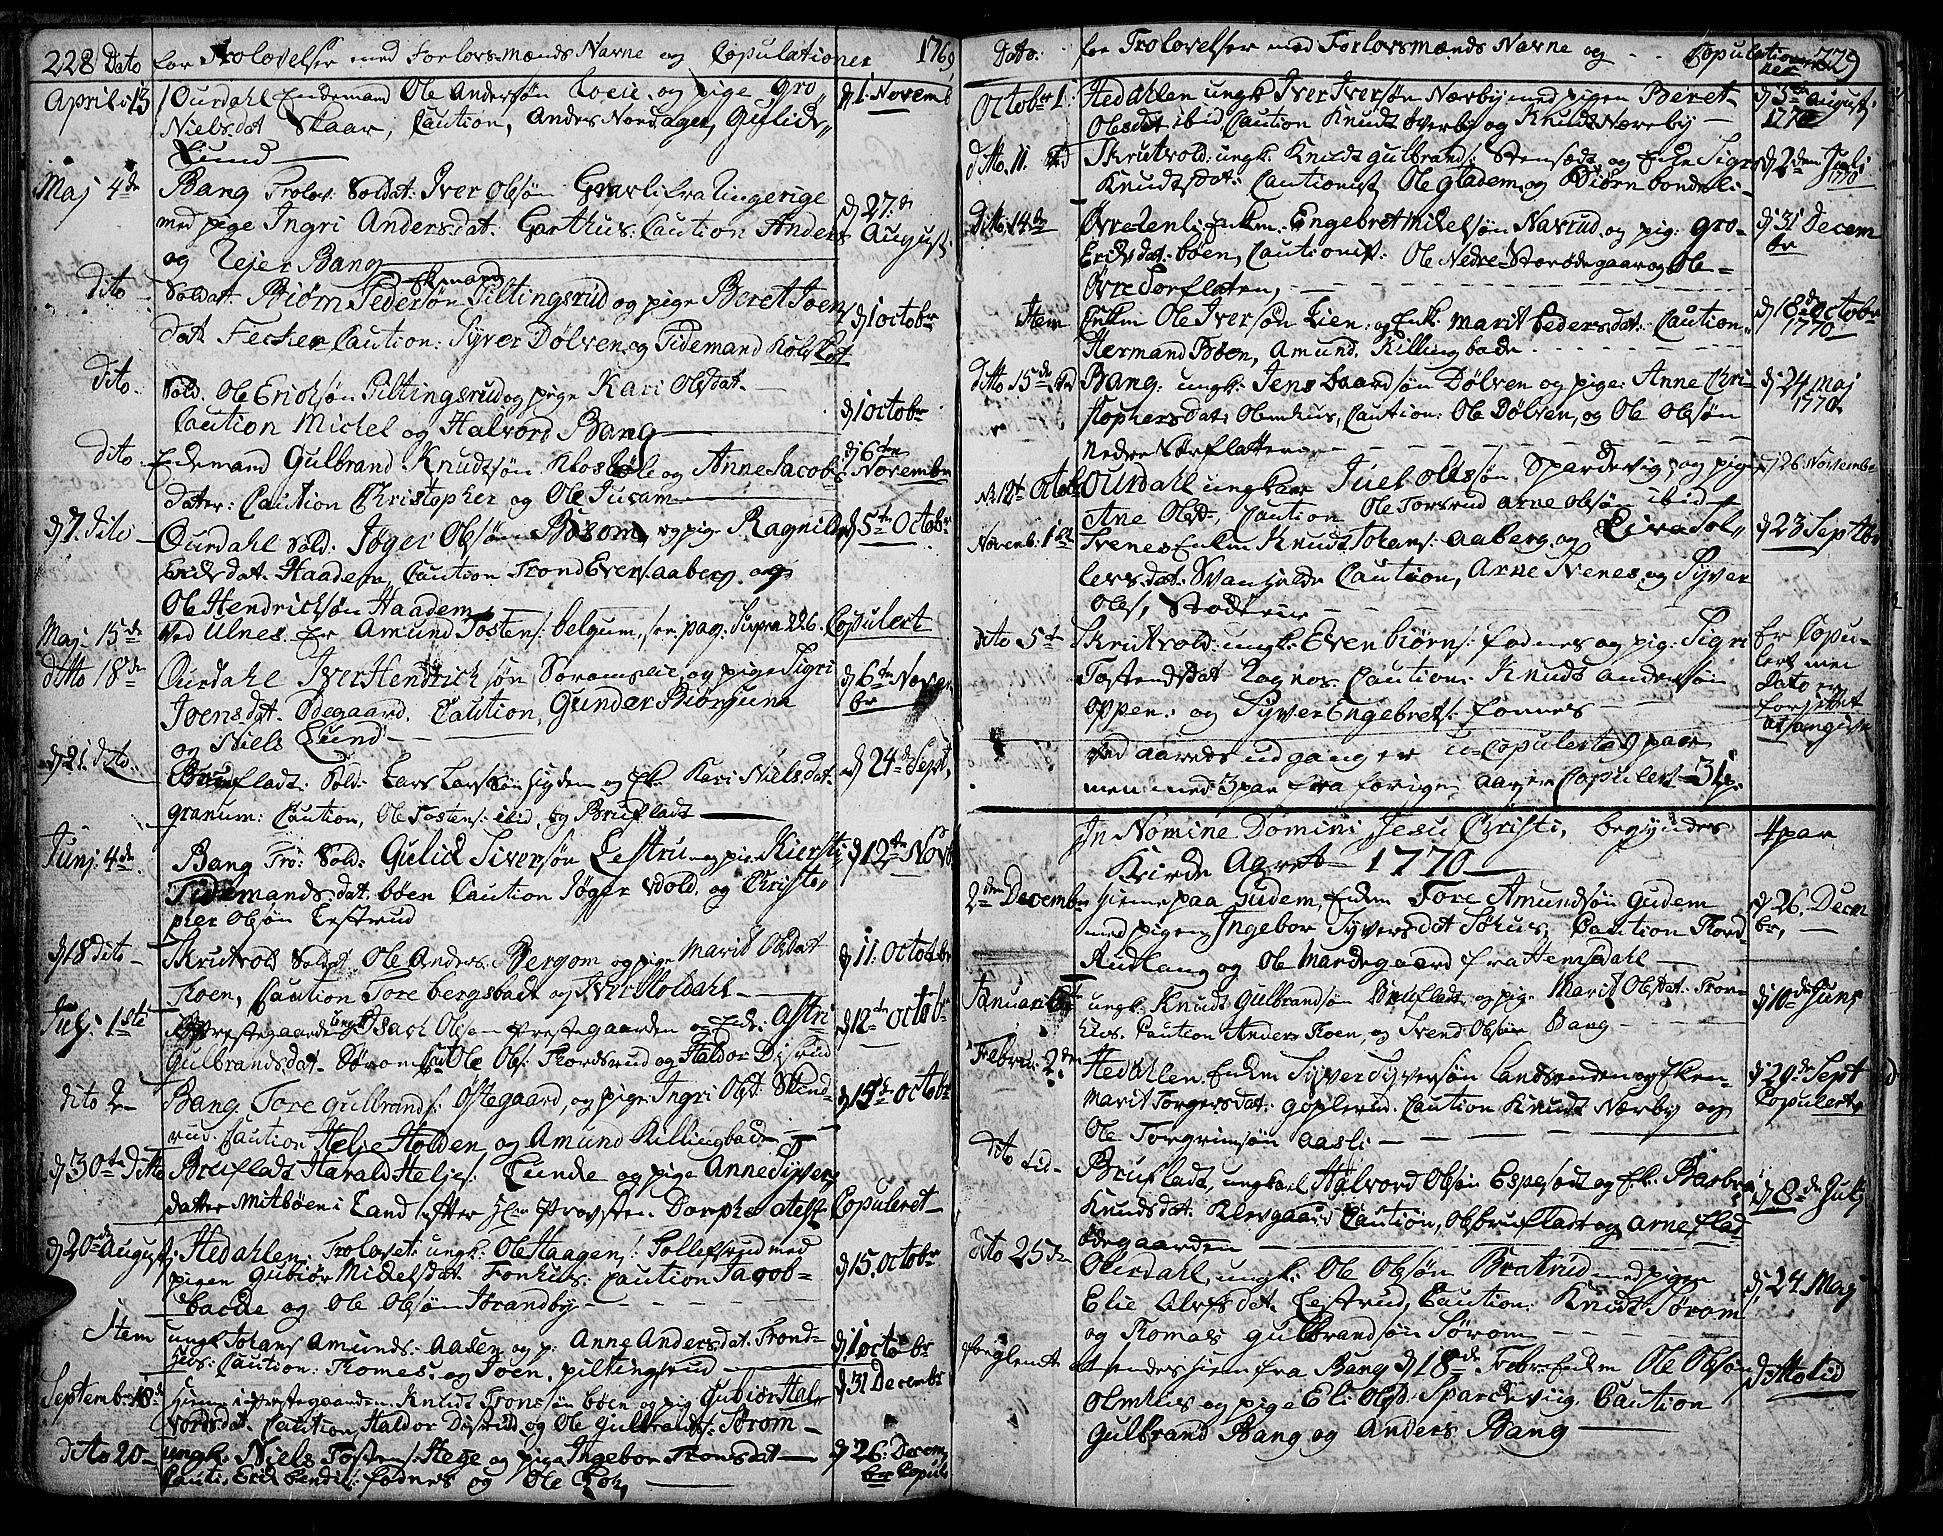 SAH, Aurdal prestekontor, Ministerialbok nr. 5, 1763-1781, s. 228-229